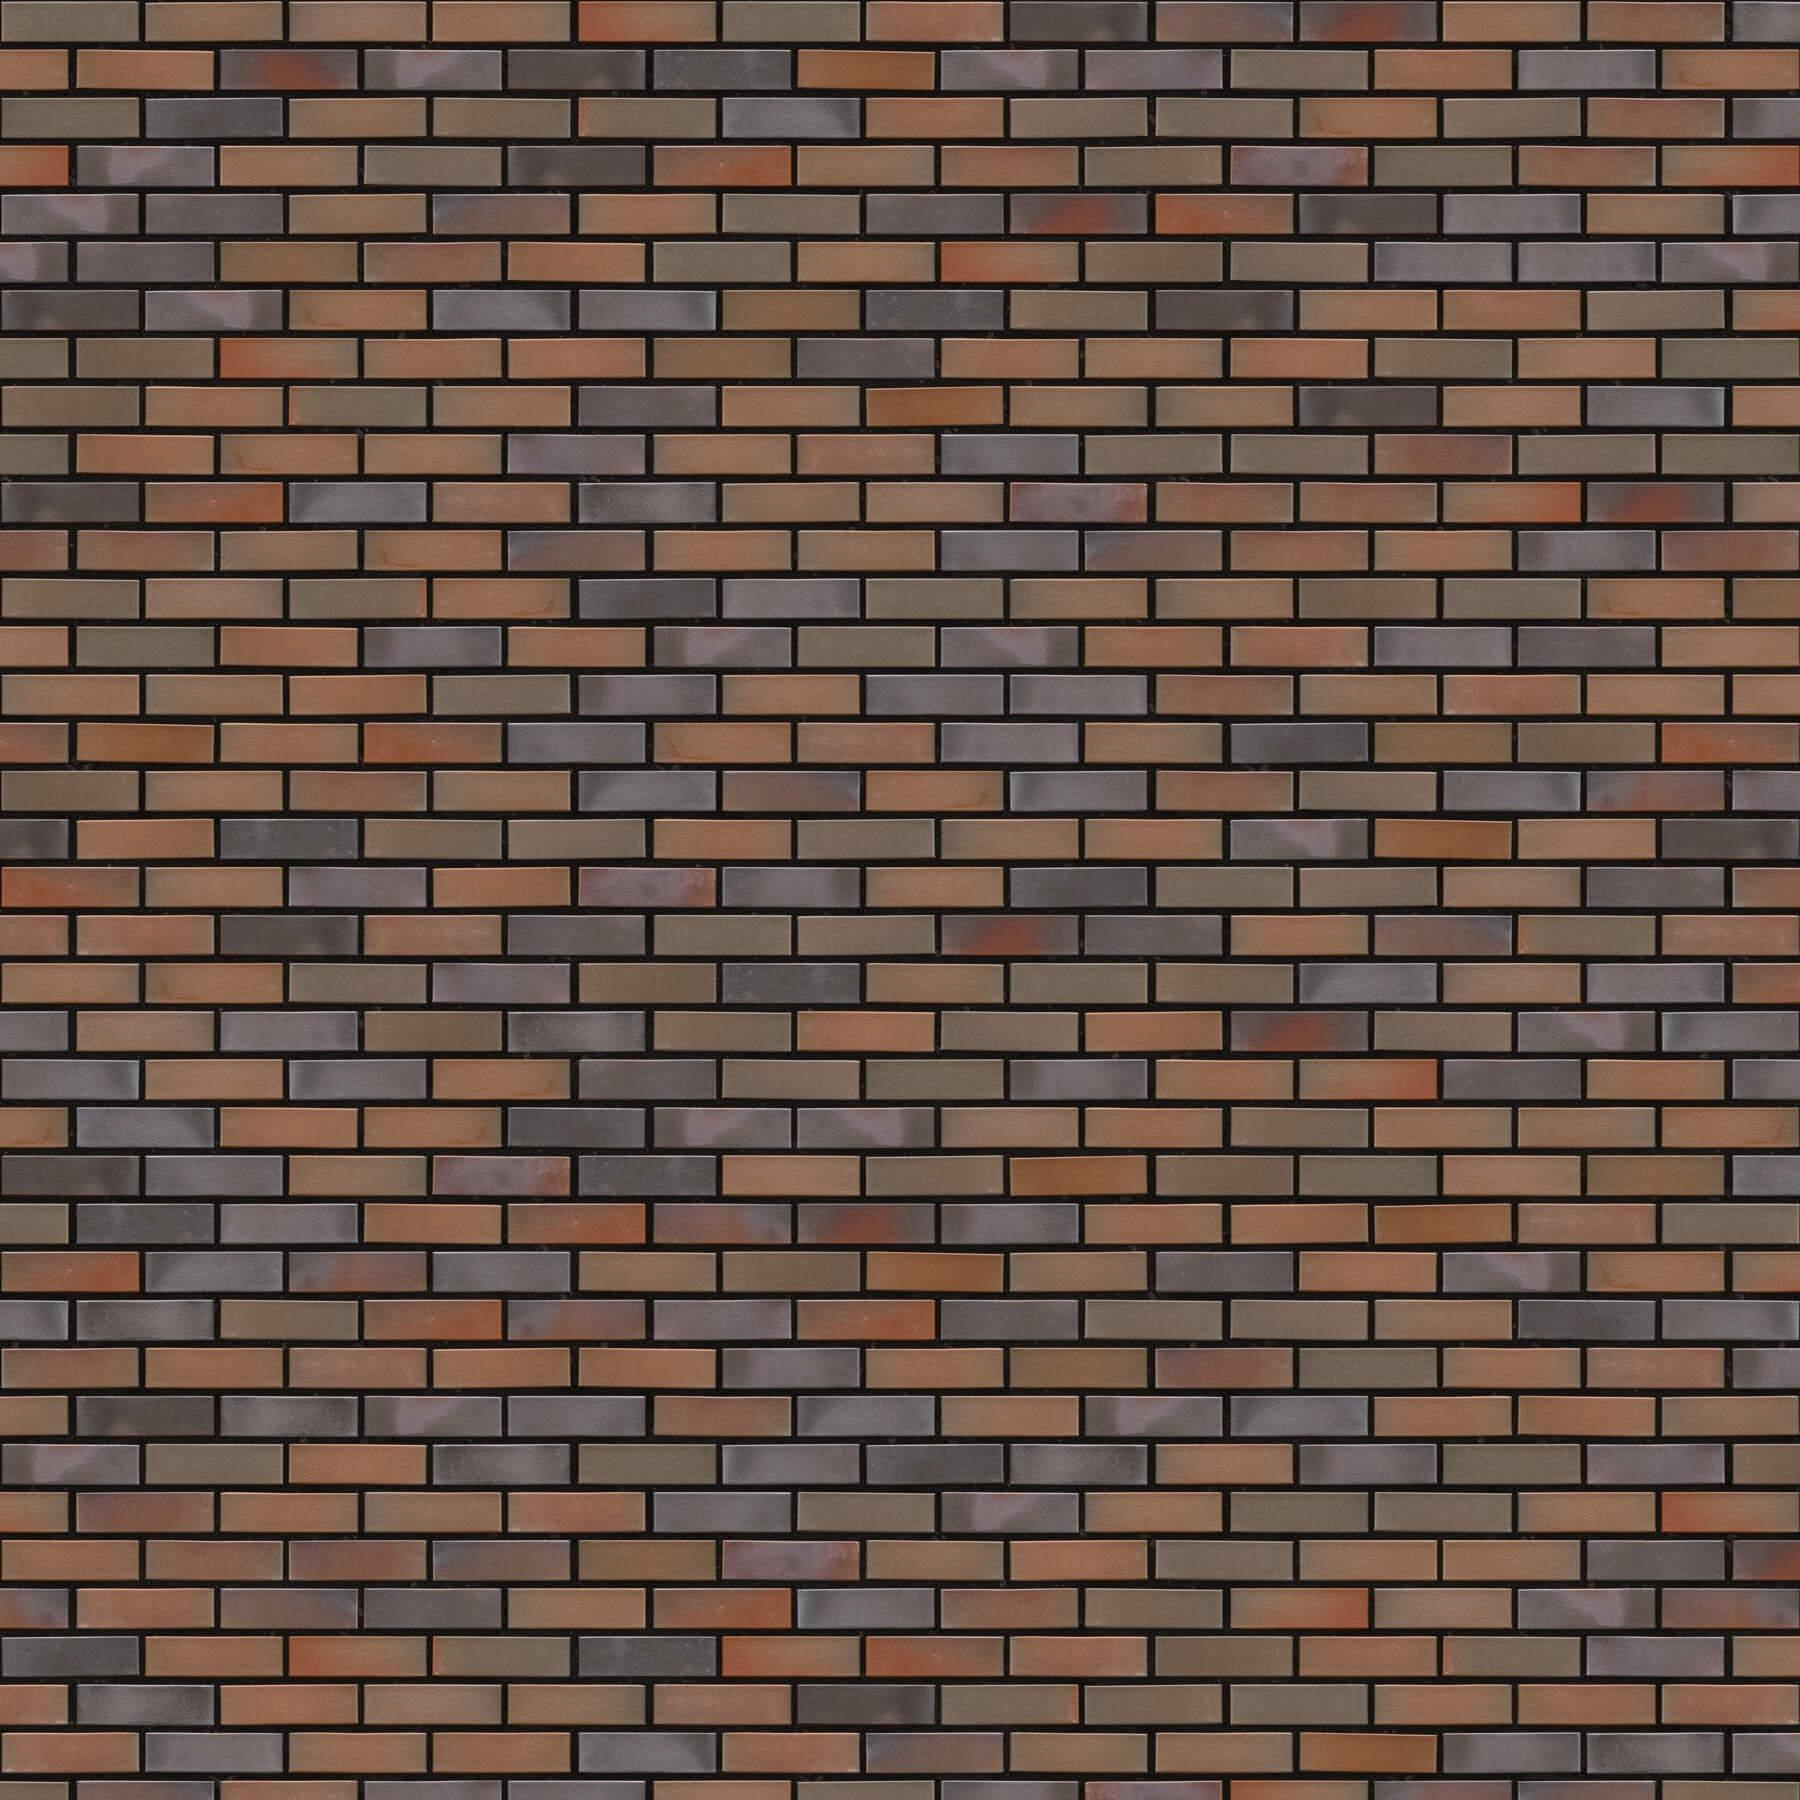 Puna-cigla-FeldHaus-Klinker-brick-house-Beograd-nf-k-350-Antracit Fuga